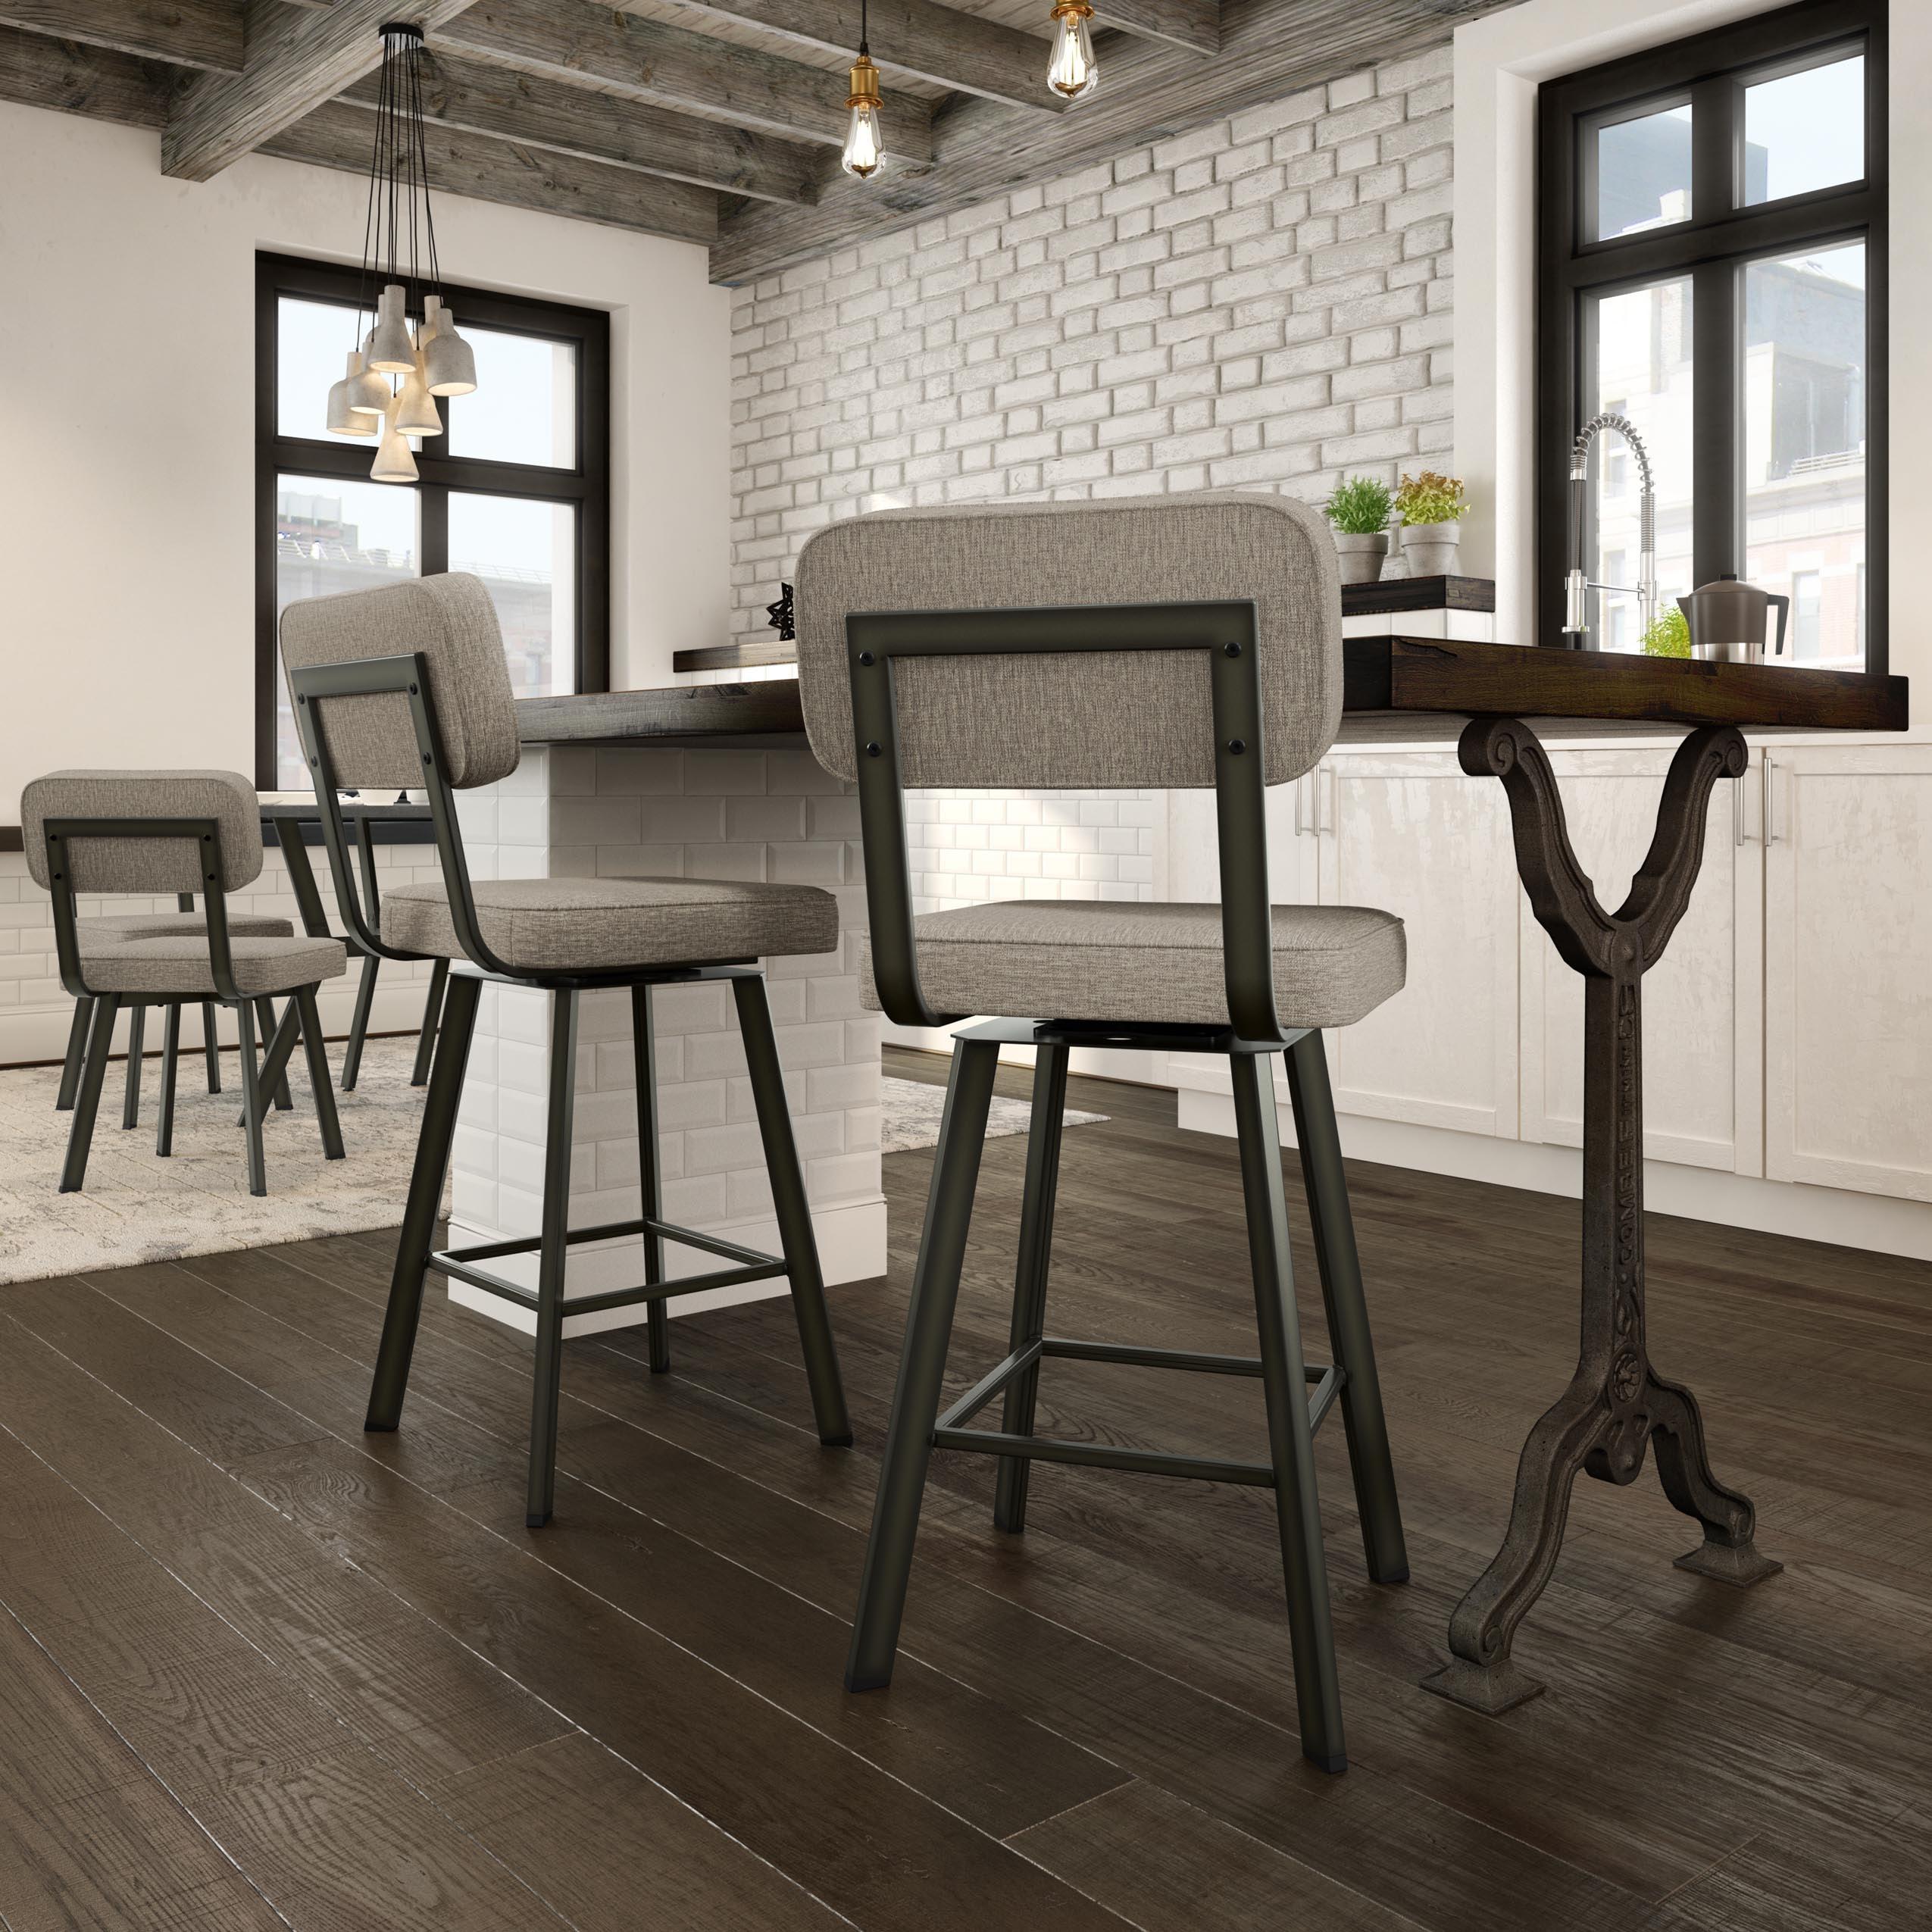 Stools Furniture Upper Room Home Furnishings Ottawa